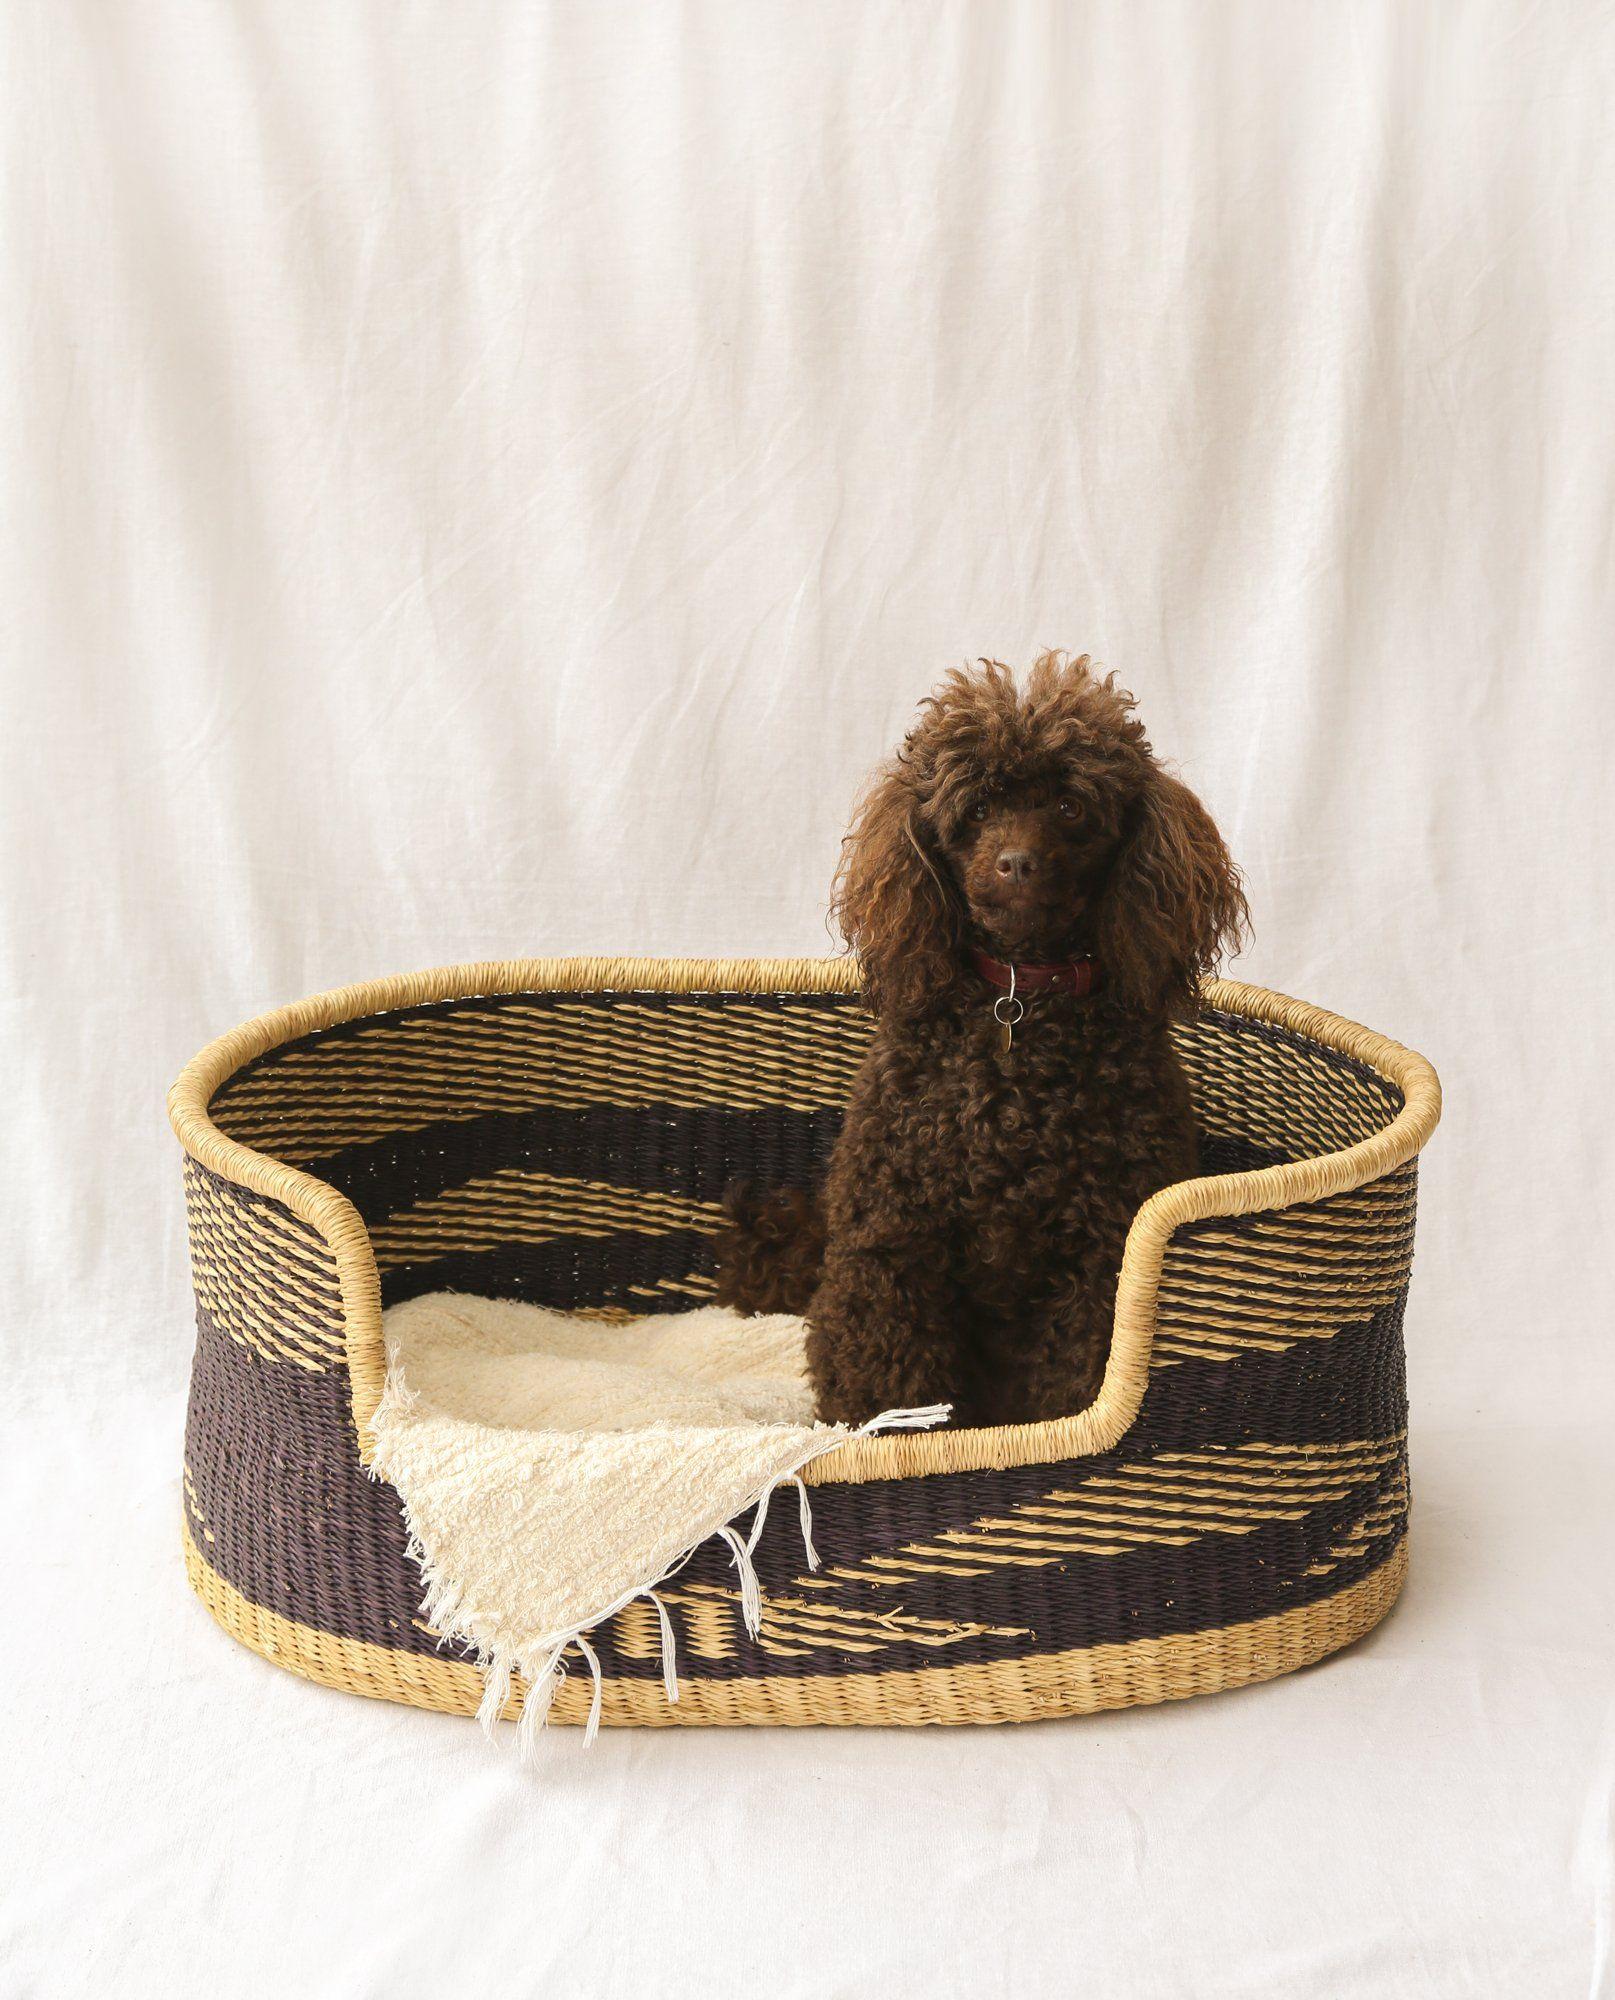 NANDI Handwoven Dog Basket Basket, Hand weaving, Small dogs